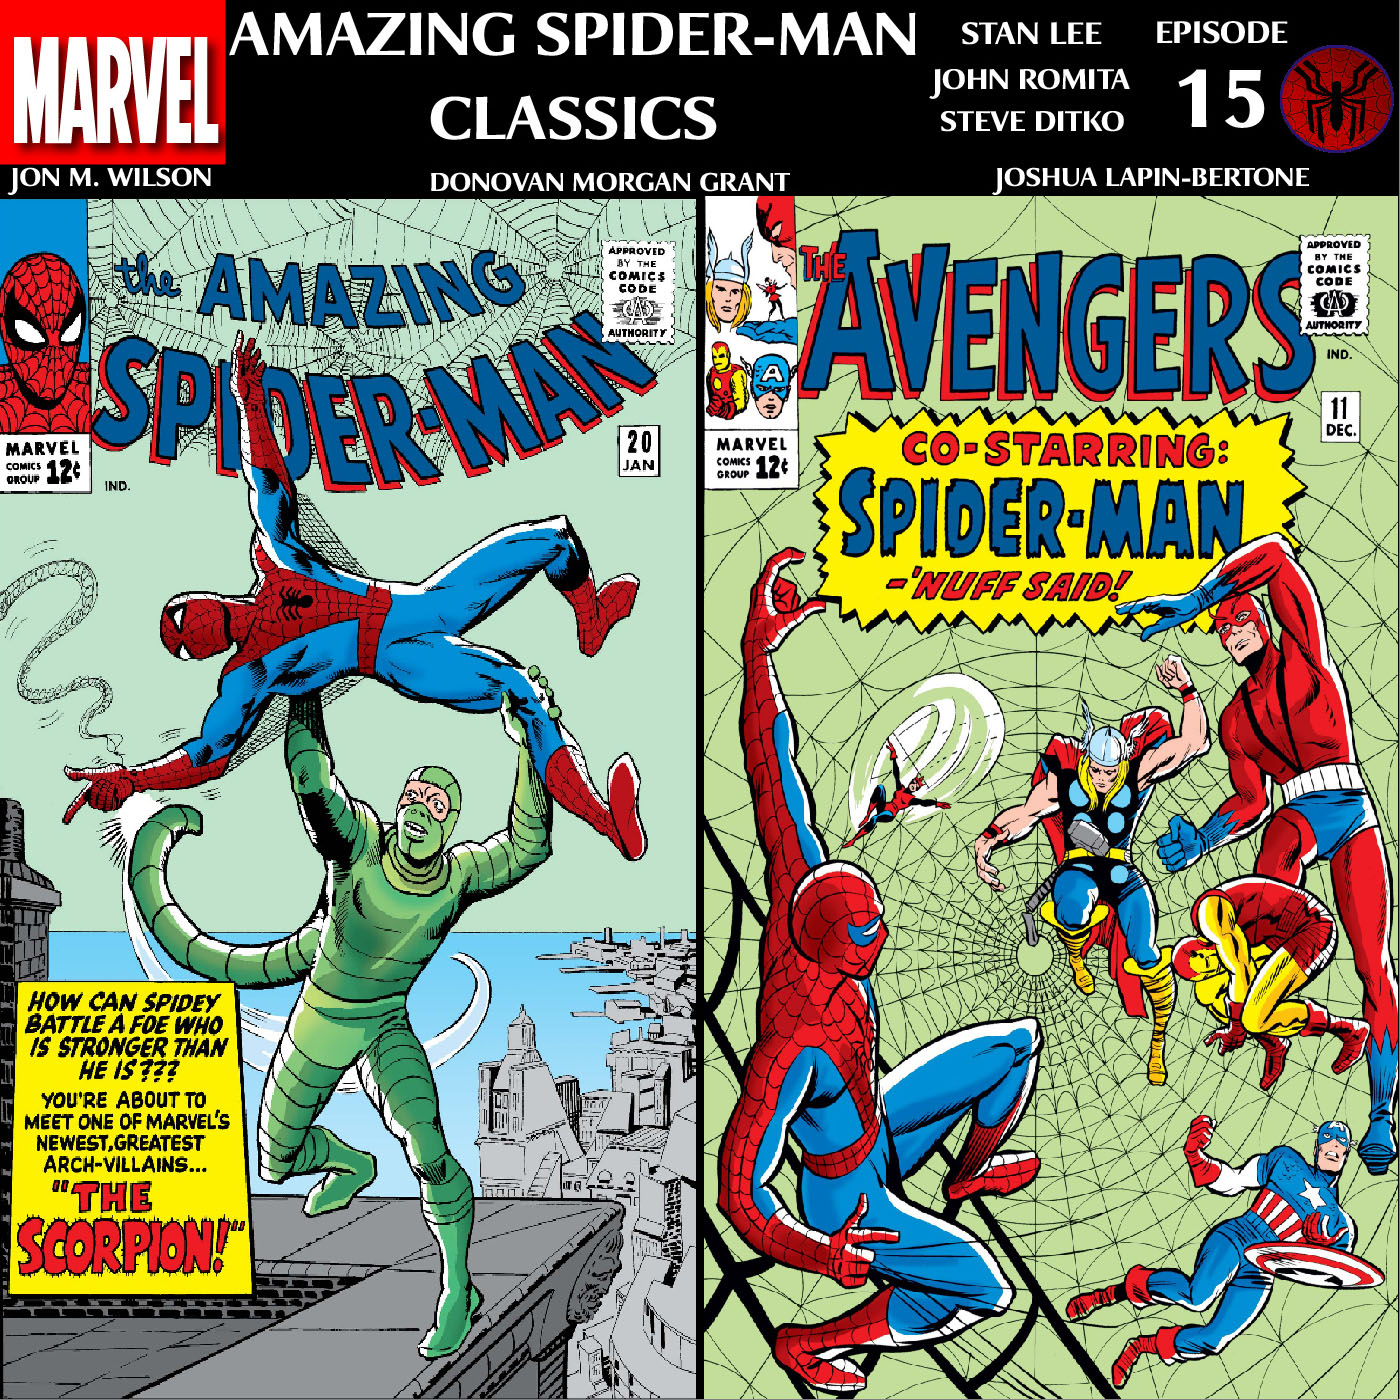 ASM Classics Episode 15: ASM 20 and Avengers 11